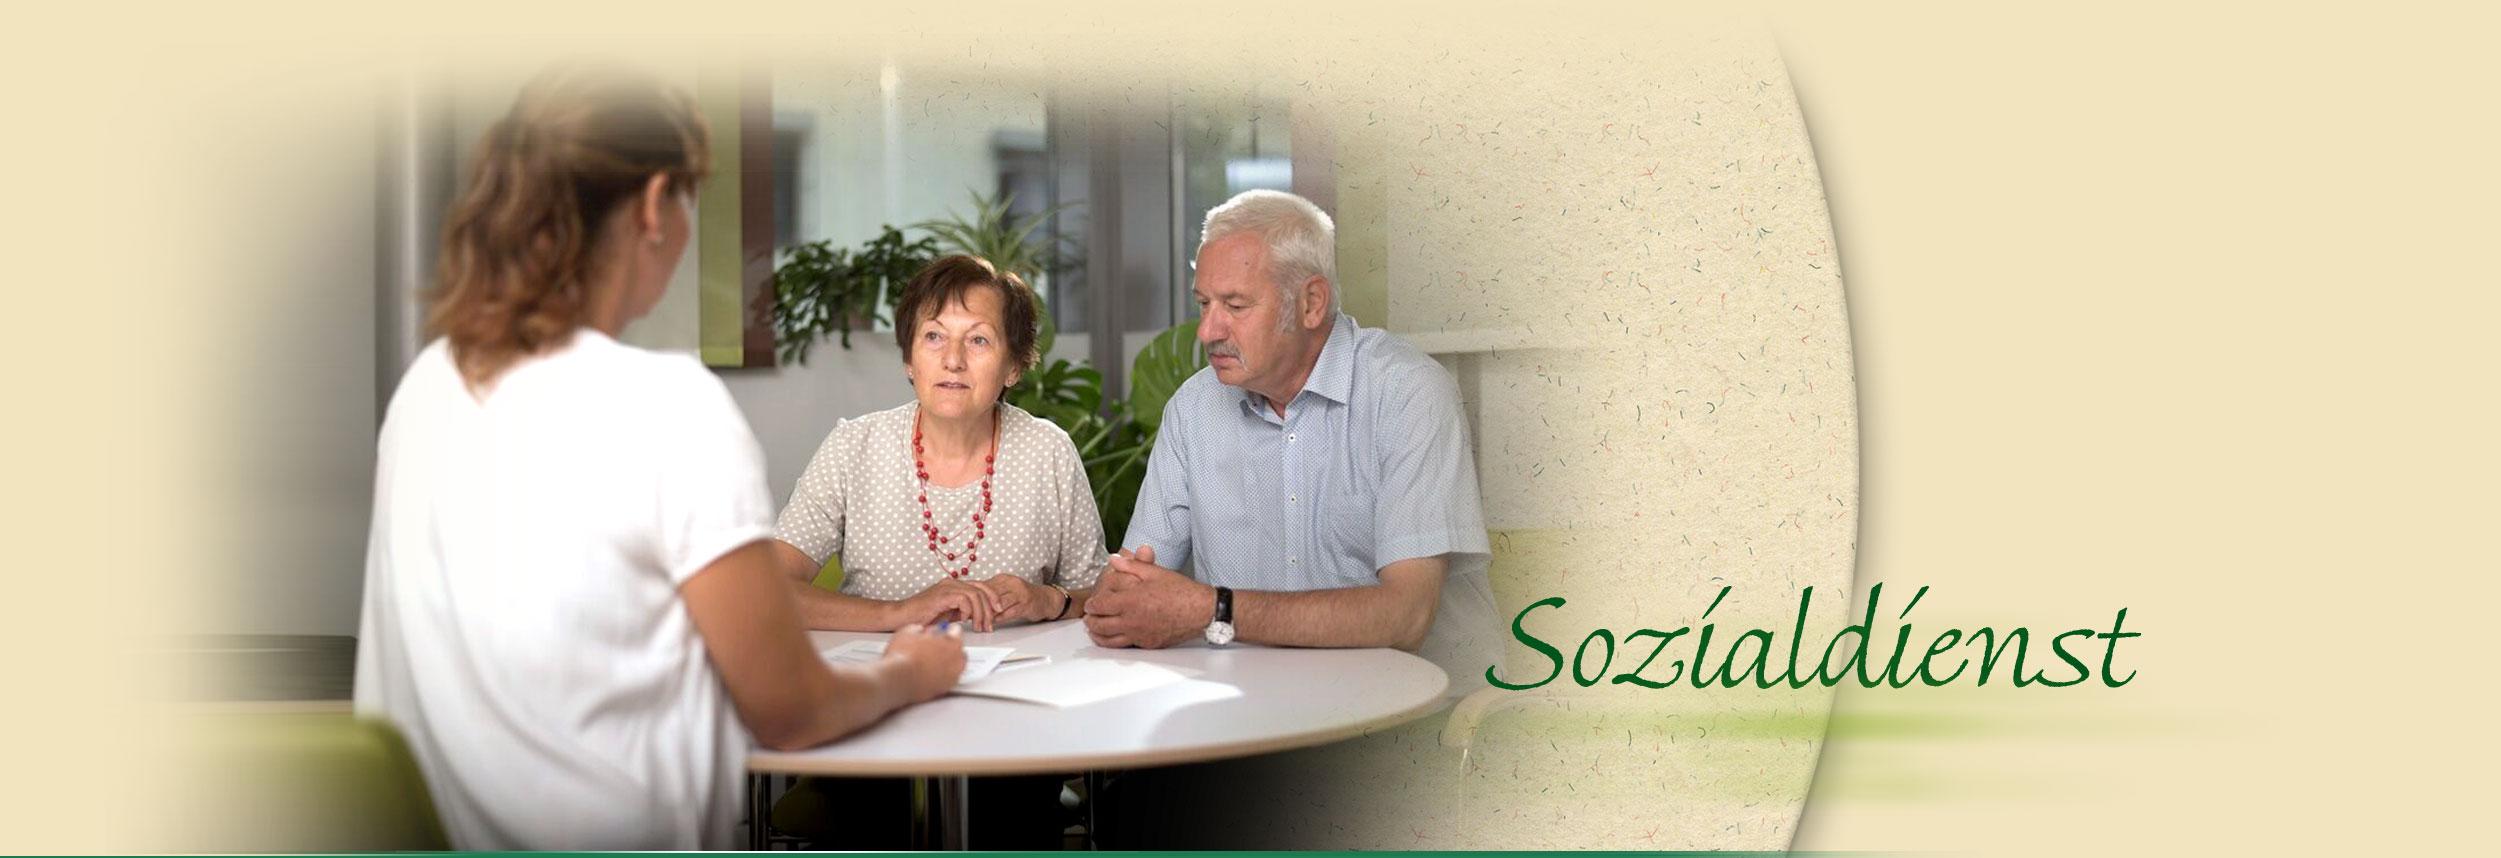 Sozialdienst - Seniorenheime Freiberg gGmbH